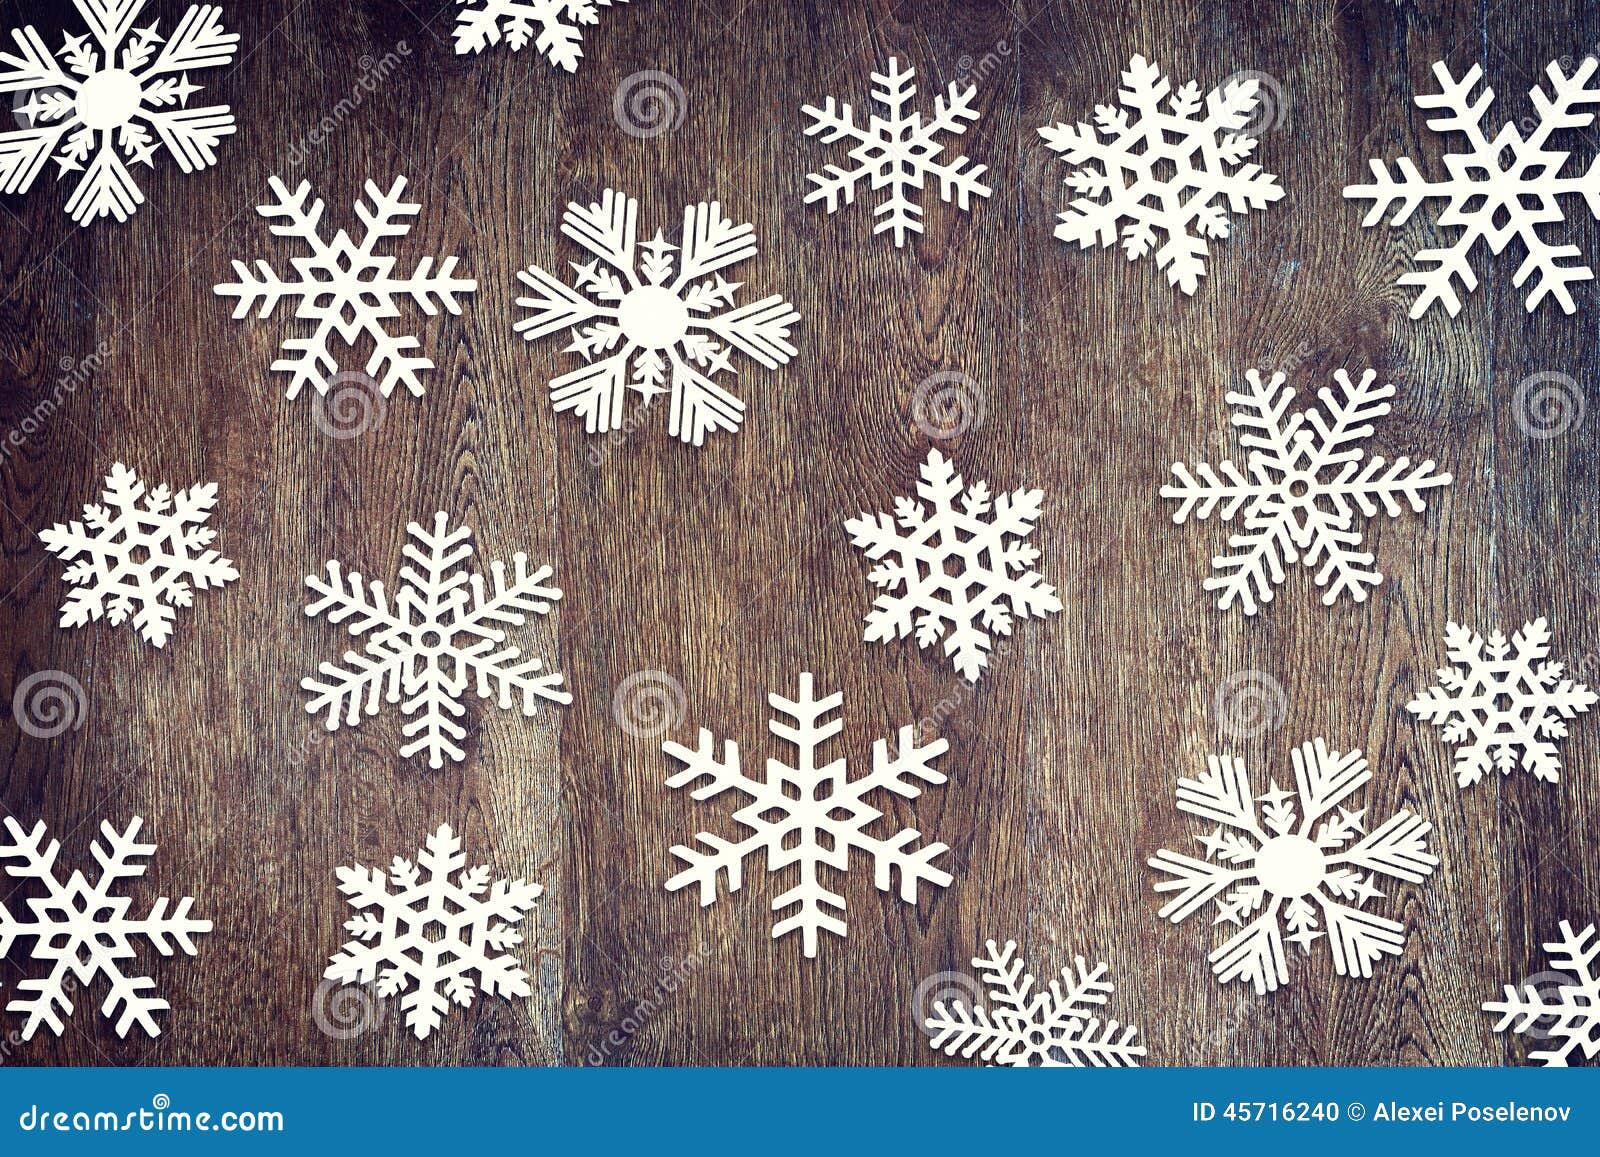 Fiocchi Di Neve Di Carta Modelli : Fondo di natale con i vari fiocchi di neve di carta fotografia